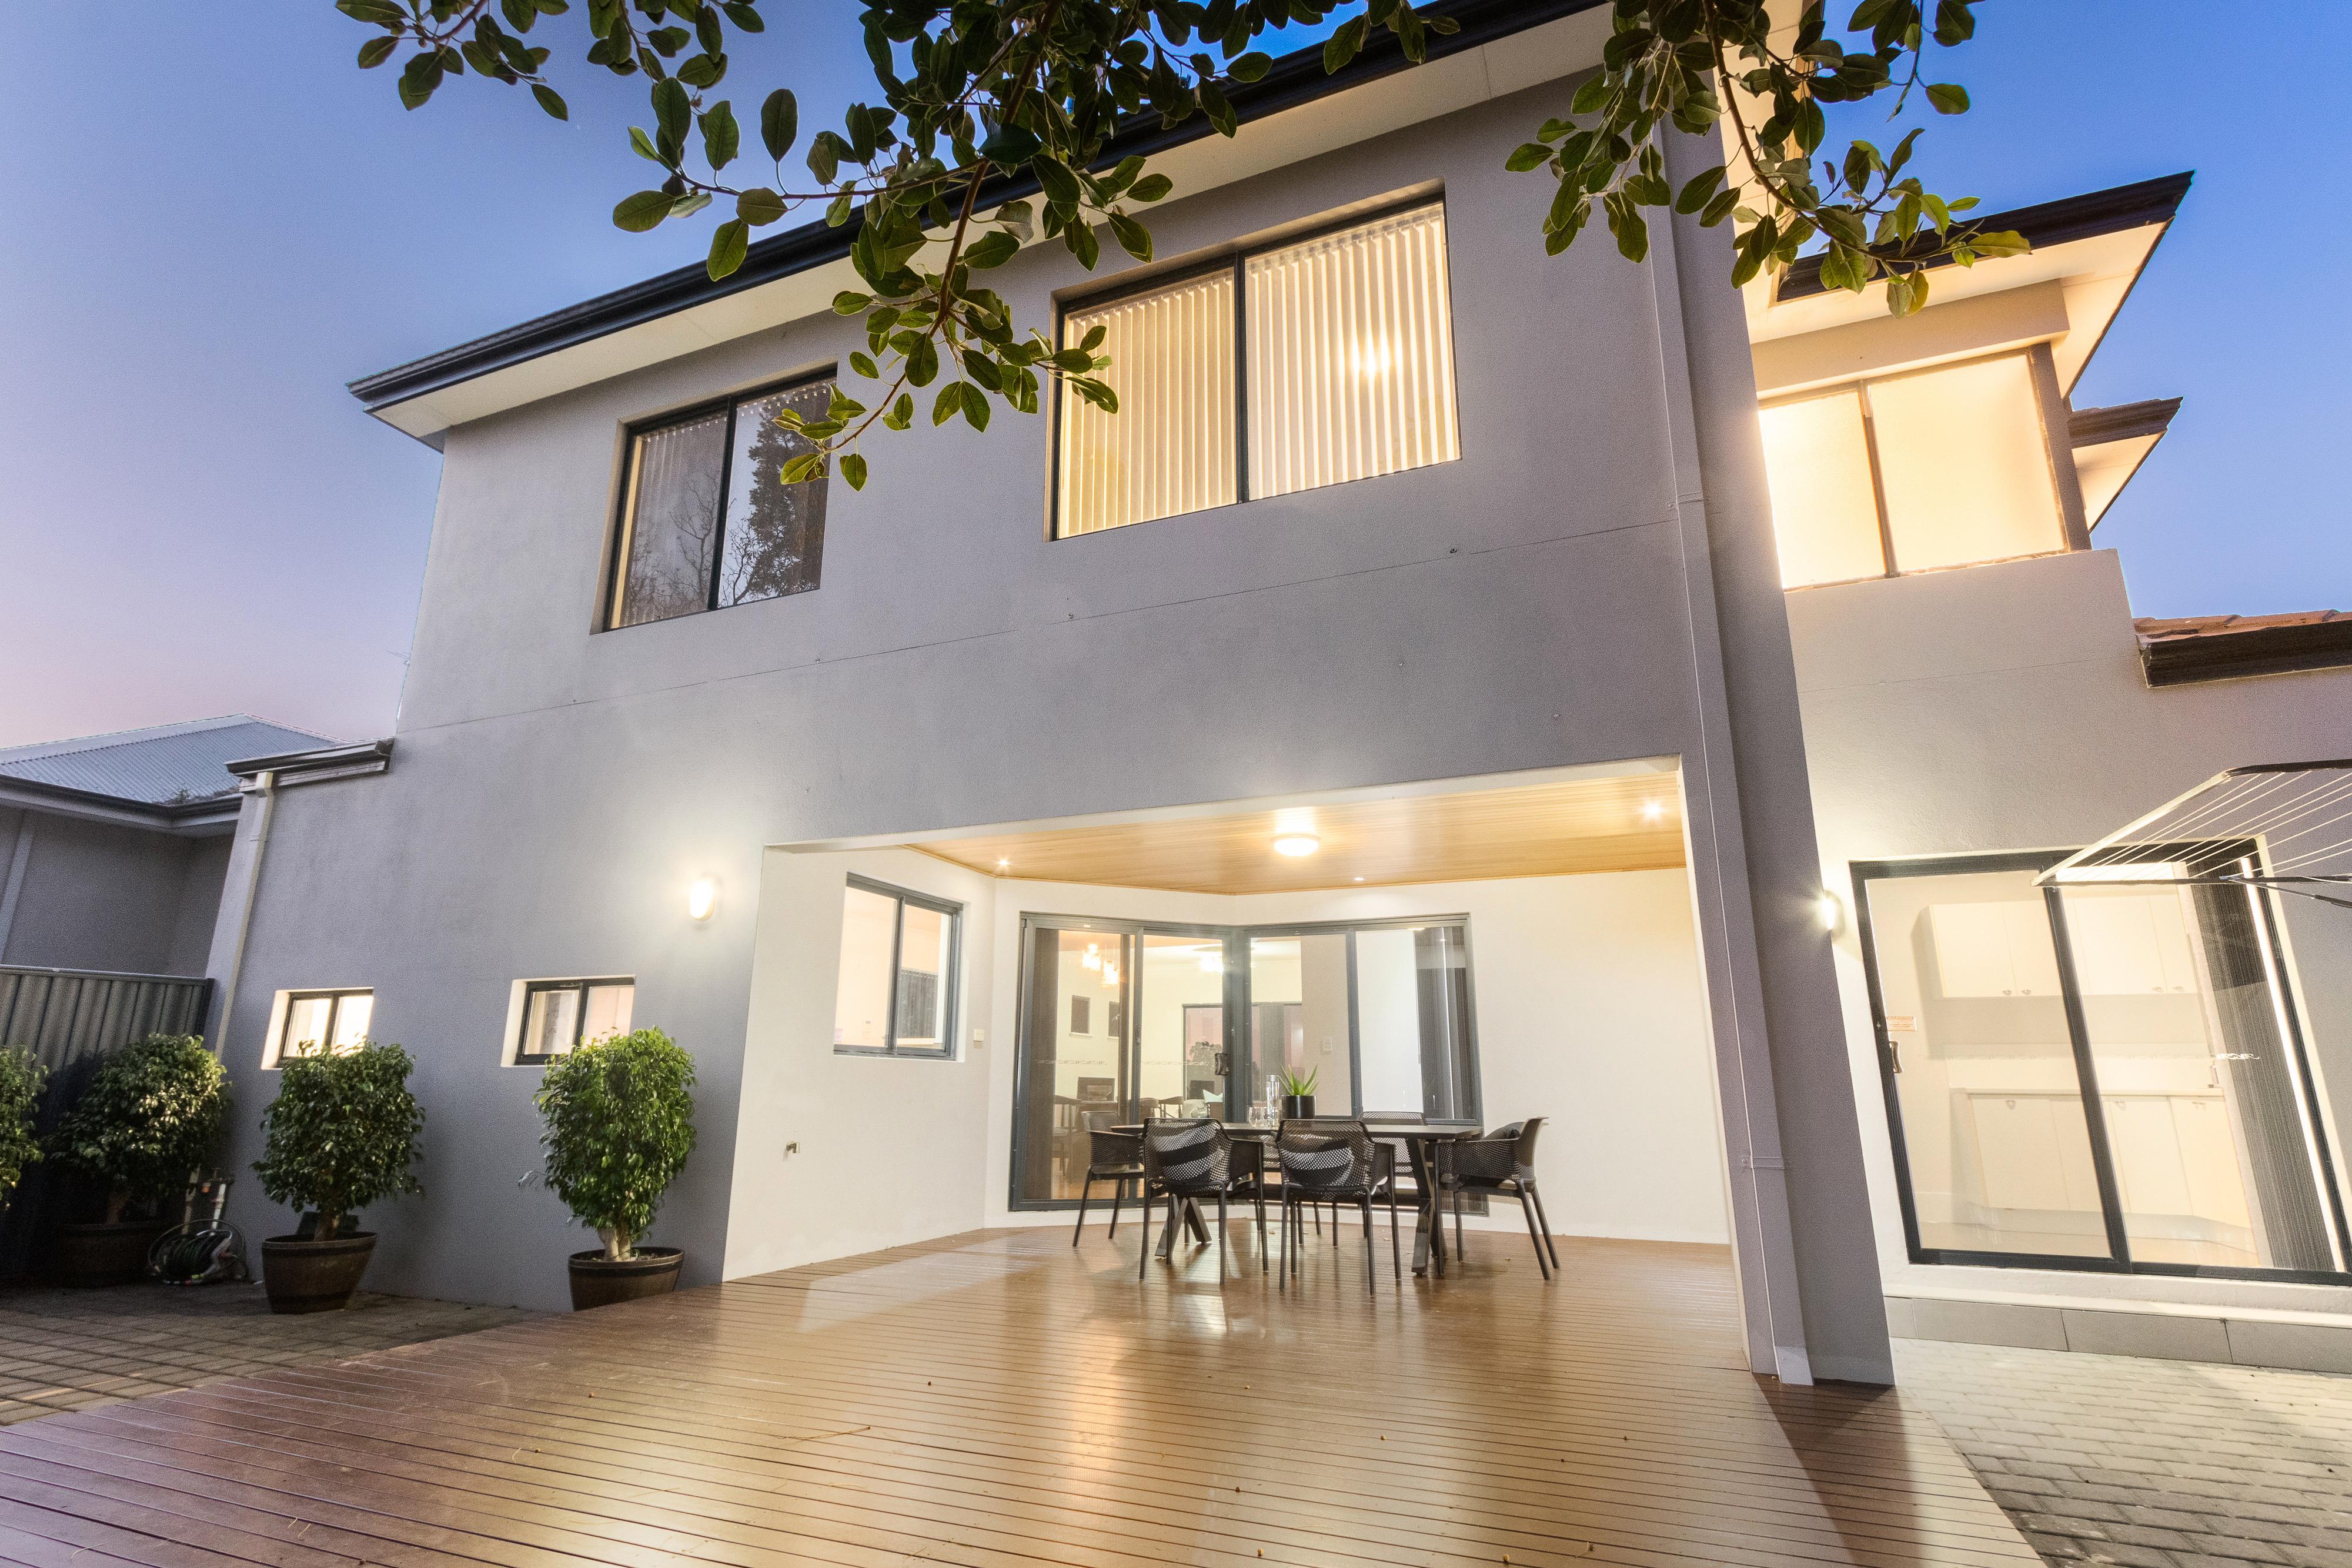 13 Hallin Court Ardross - House For Sale - 23268981 - ACTON Applecross